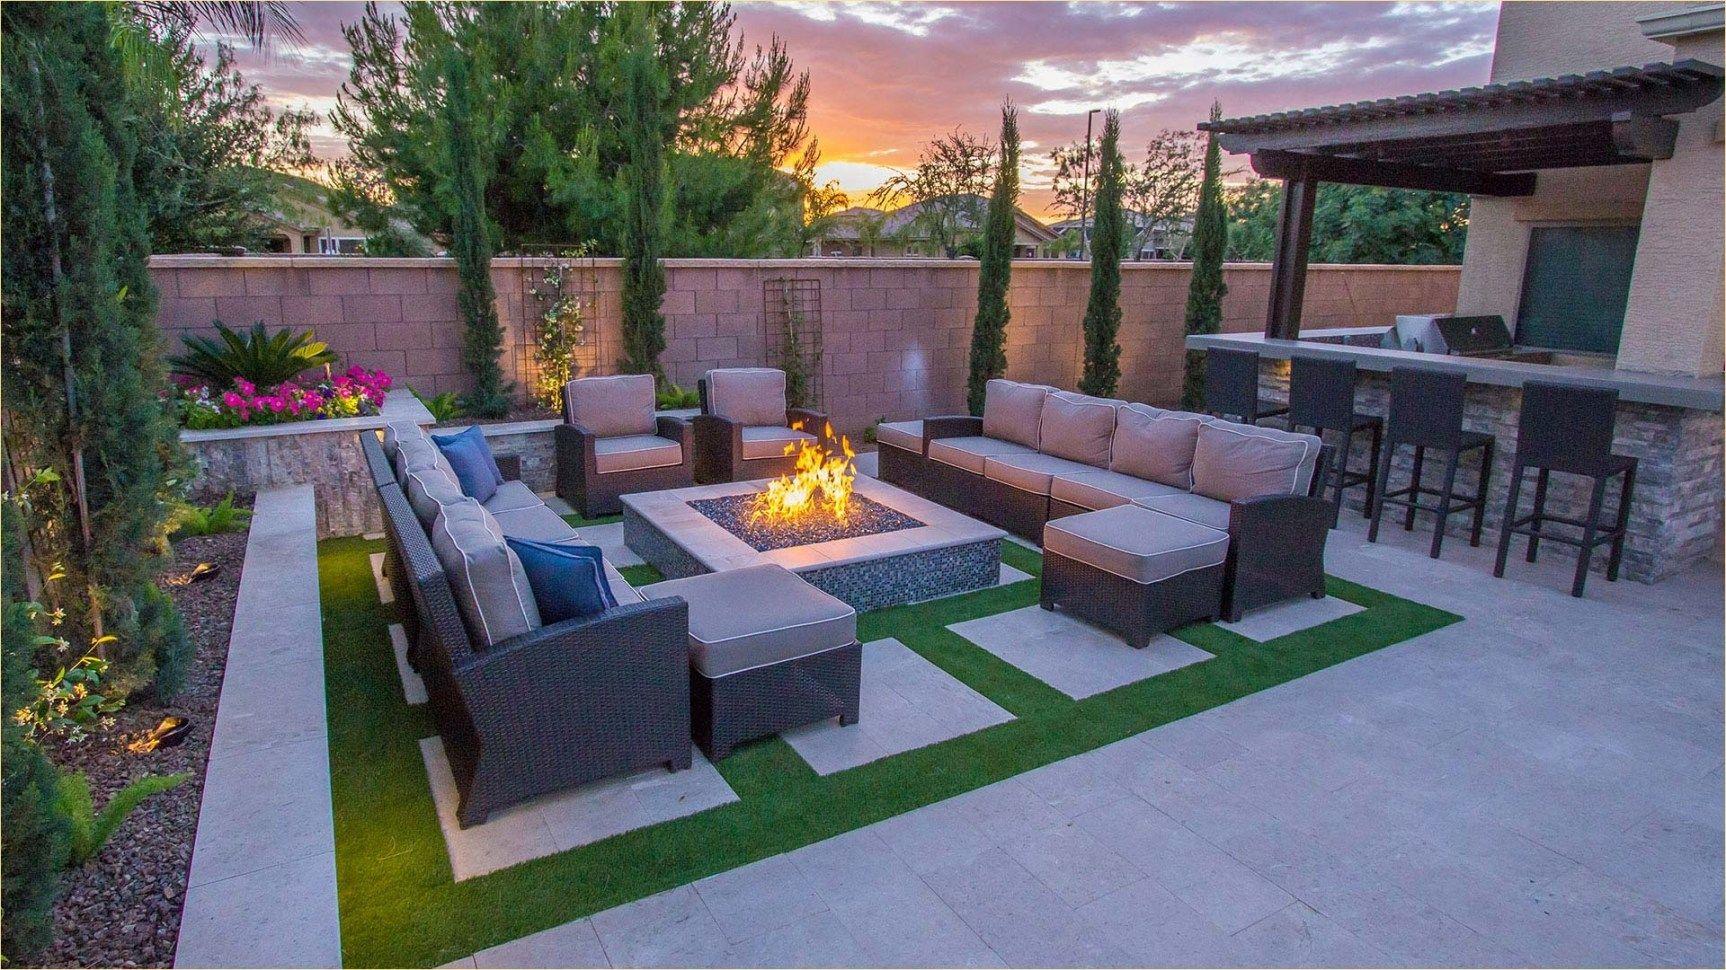 50 stylish small backyard with hardscape ideas modern on modern deck patio ideas for backyard design and decoration ideas id=46495